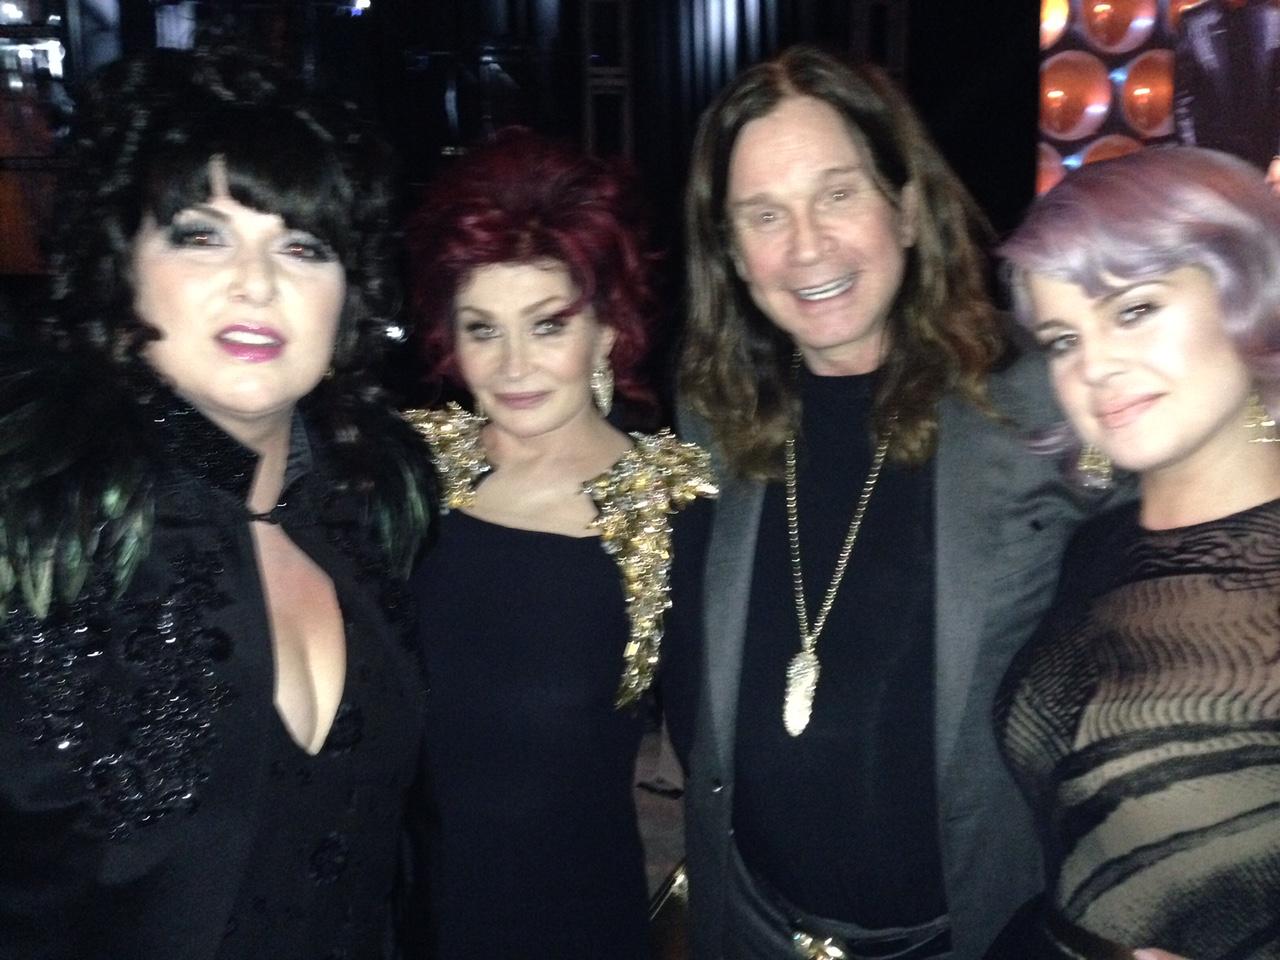 Ann Wilson With The Osbournes at Elton John Party